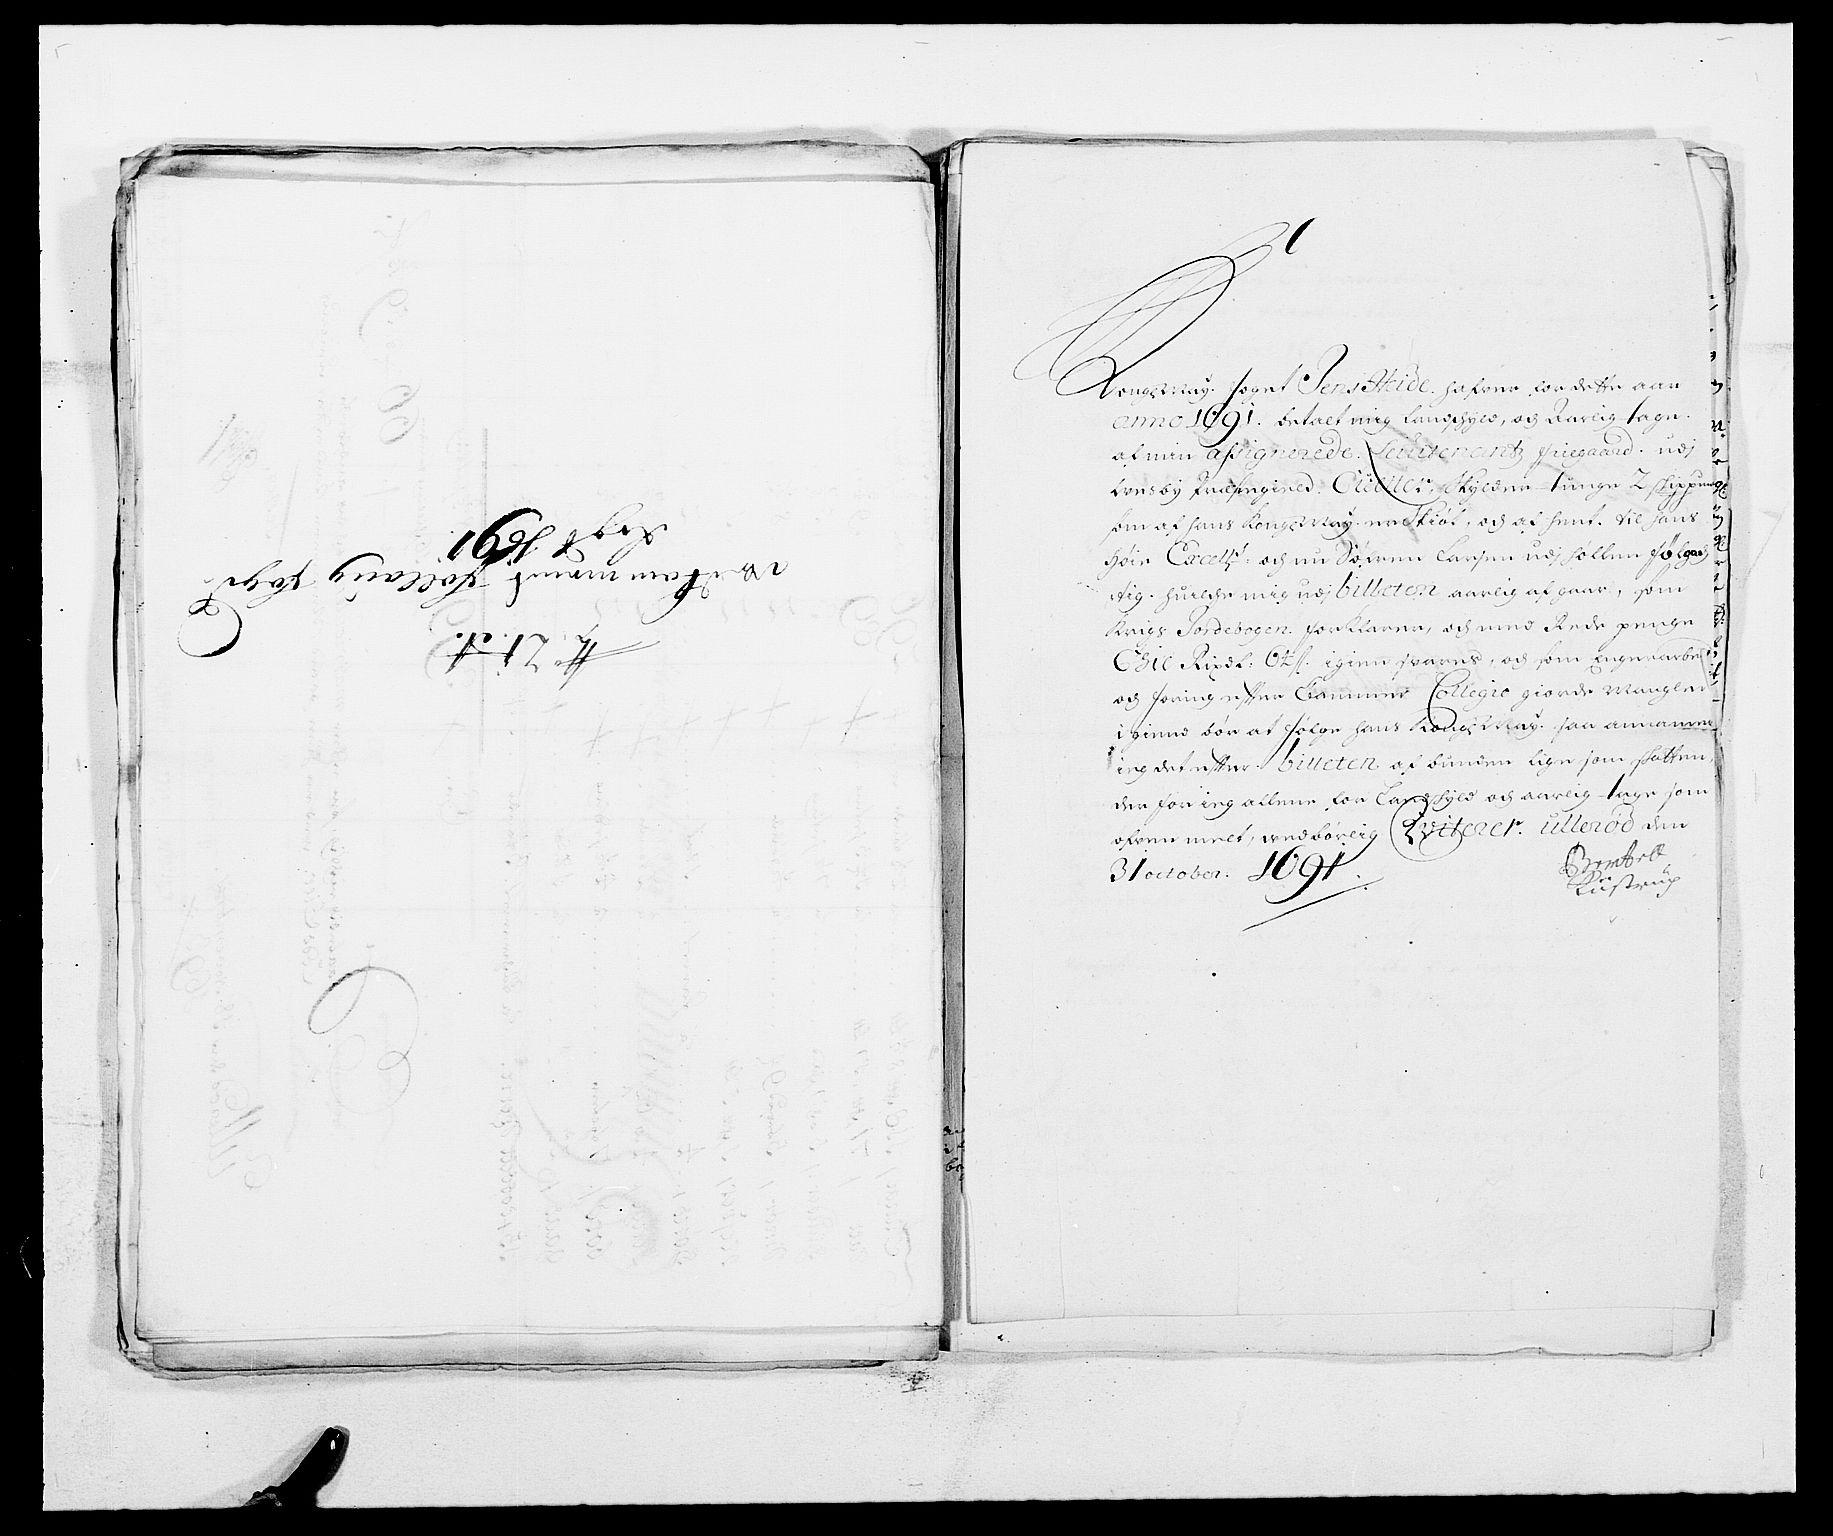 RA, Rentekammeret inntil 1814, Reviderte regnskaper, Fogderegnskap, R09/L0436: Fogderegnskap Follo, 1685-1691, s. 251